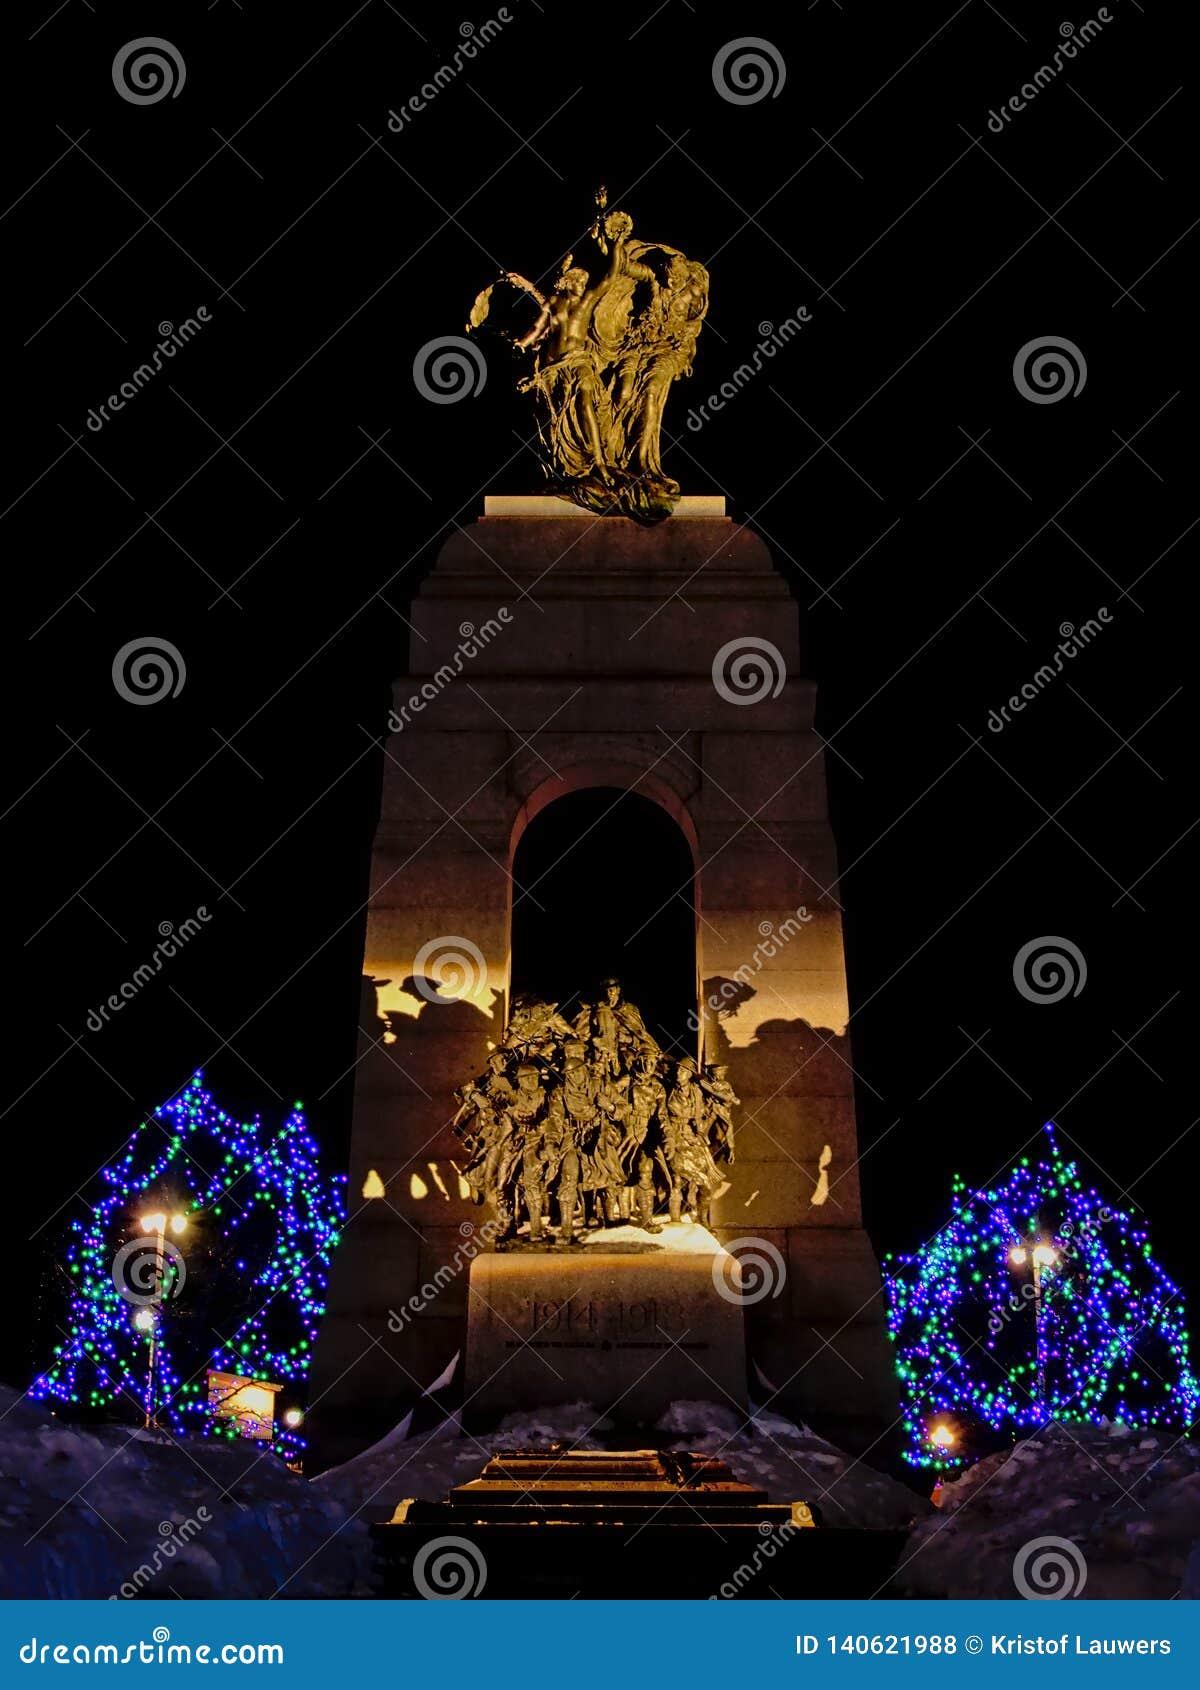 National war memorial, Ottawa, Canada, at night